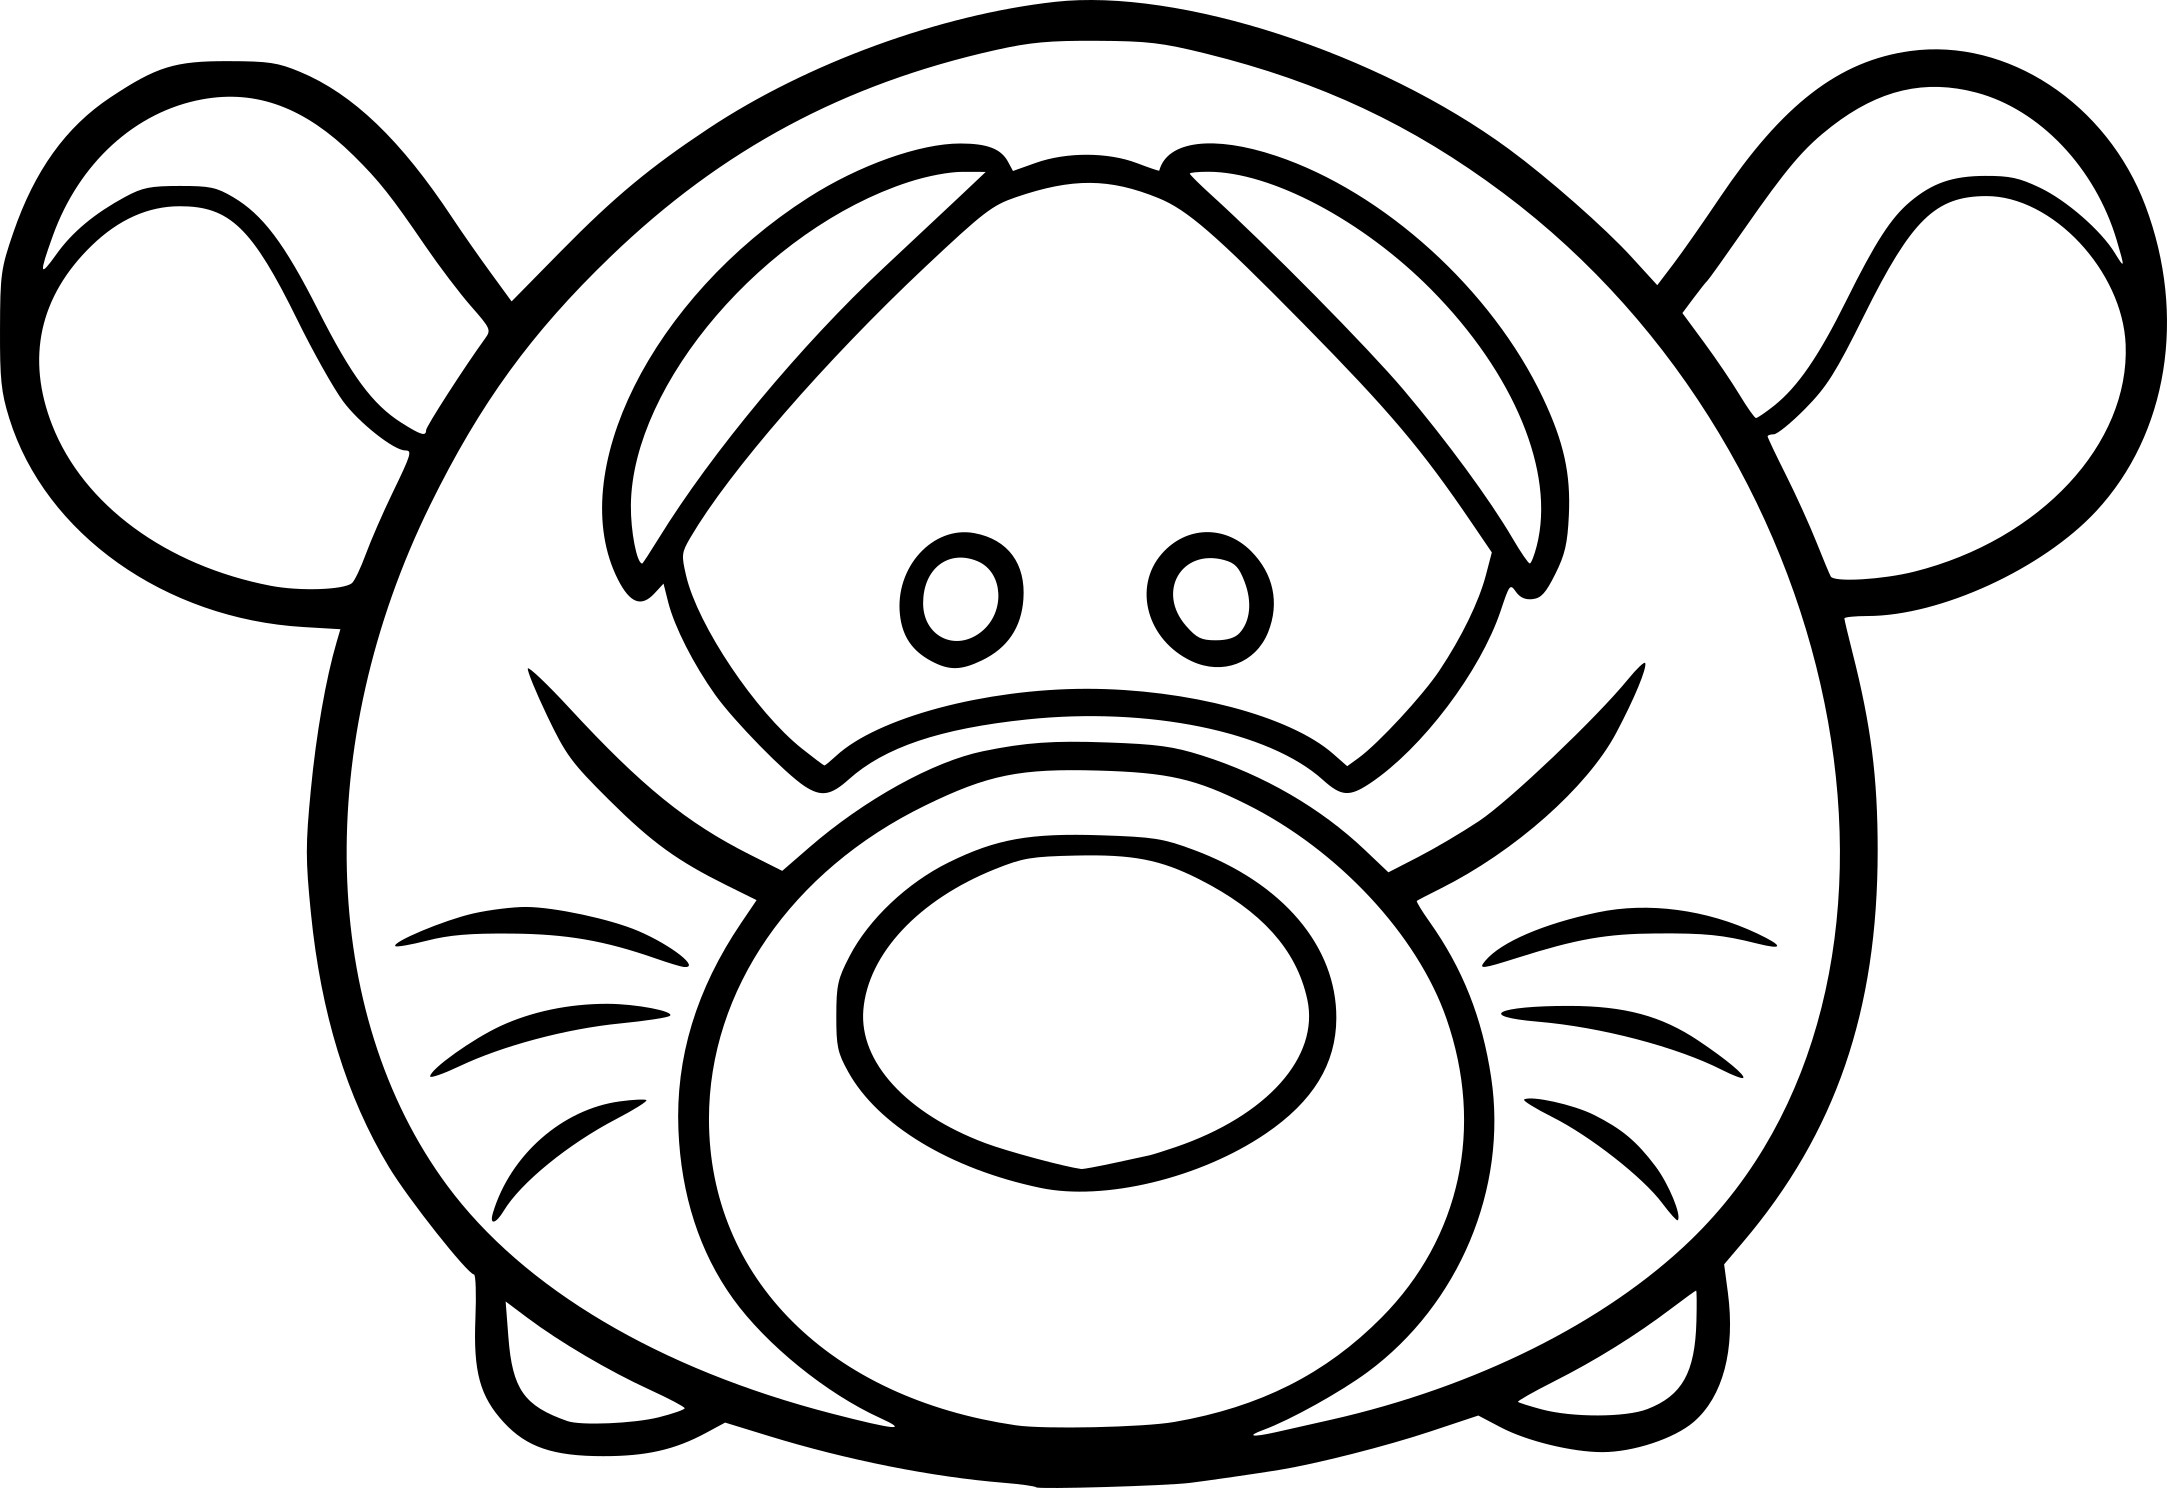 Coloriage Tsum Tsum Dumbo Disney Dessin: Coloriage Tsum Tsum Dessin à Imprimer Sur COLORIAGES .info